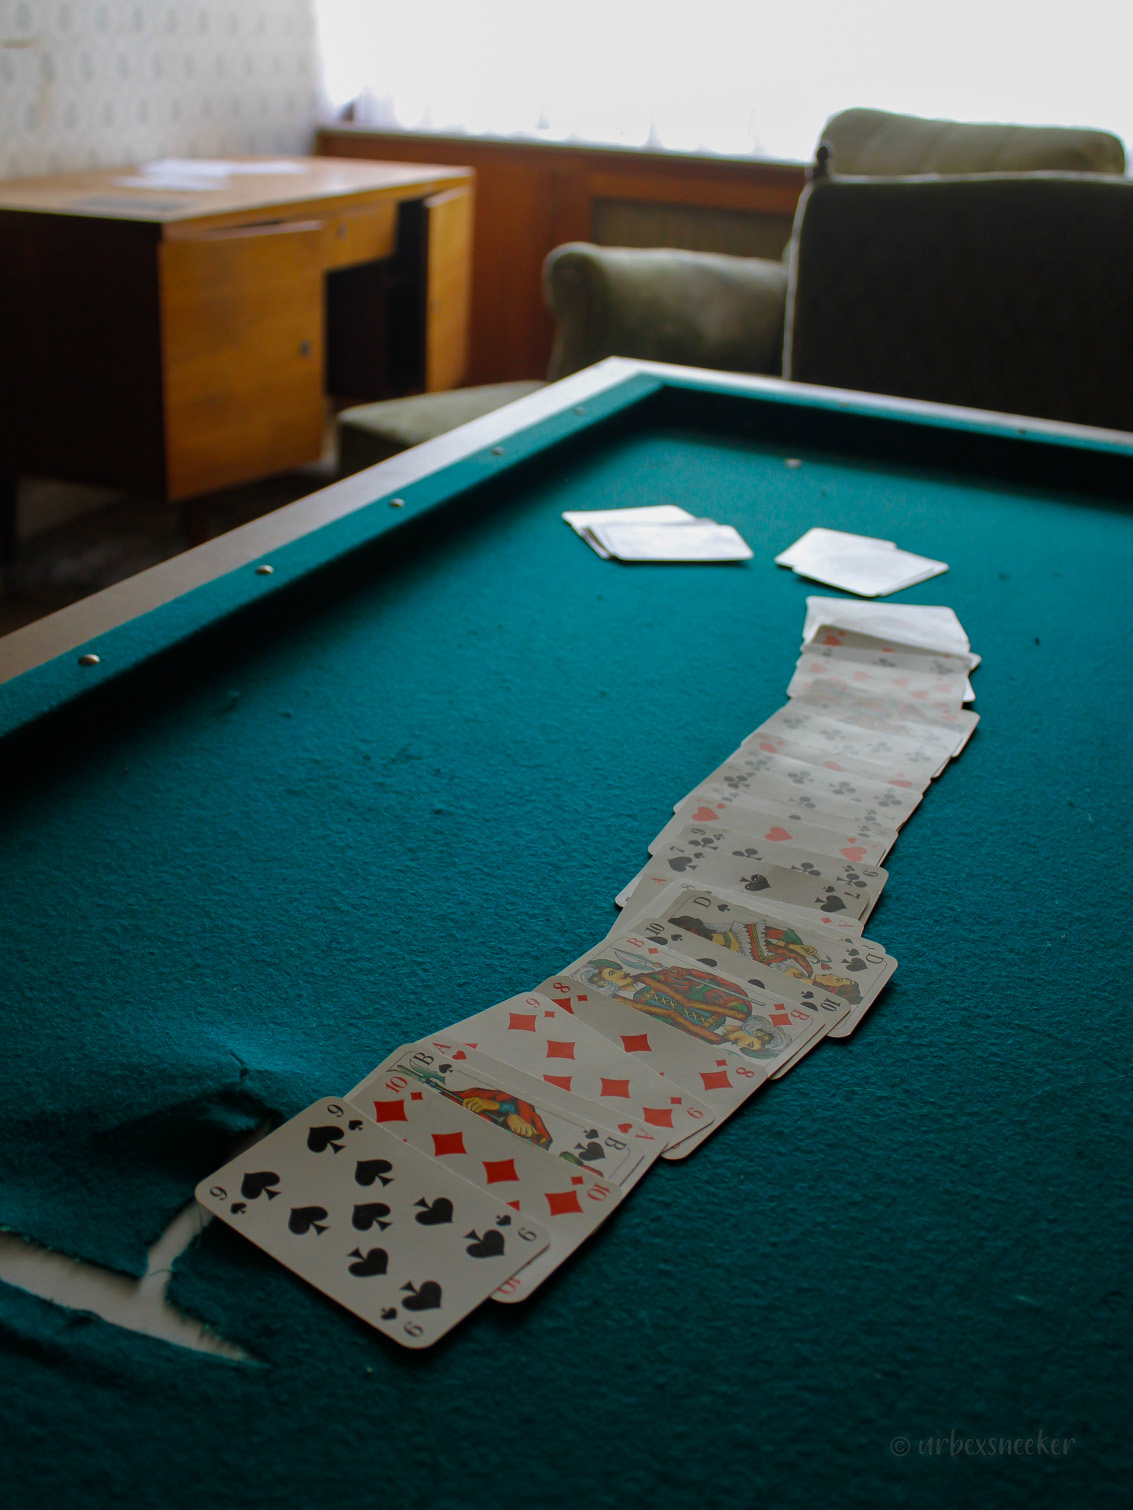 Skatkarten im verlassenen Hotel Teddy MG_5585